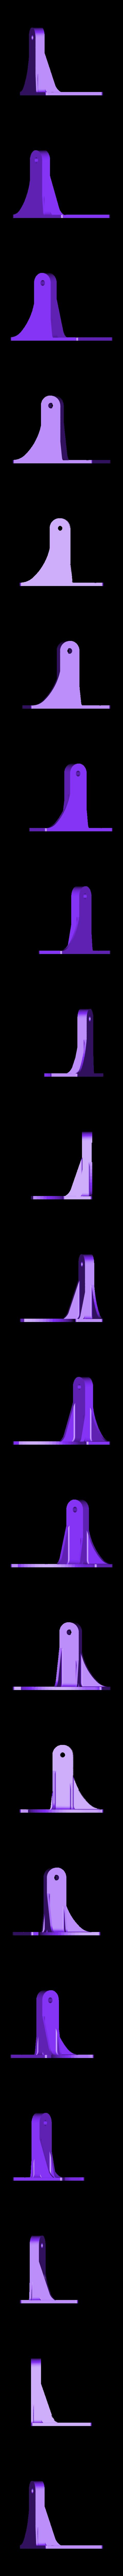 ant mount2 (1pcs).STL Download STL file Folding Quadcopter 450 Frame • 3D print object, AleksandrDolzhenko